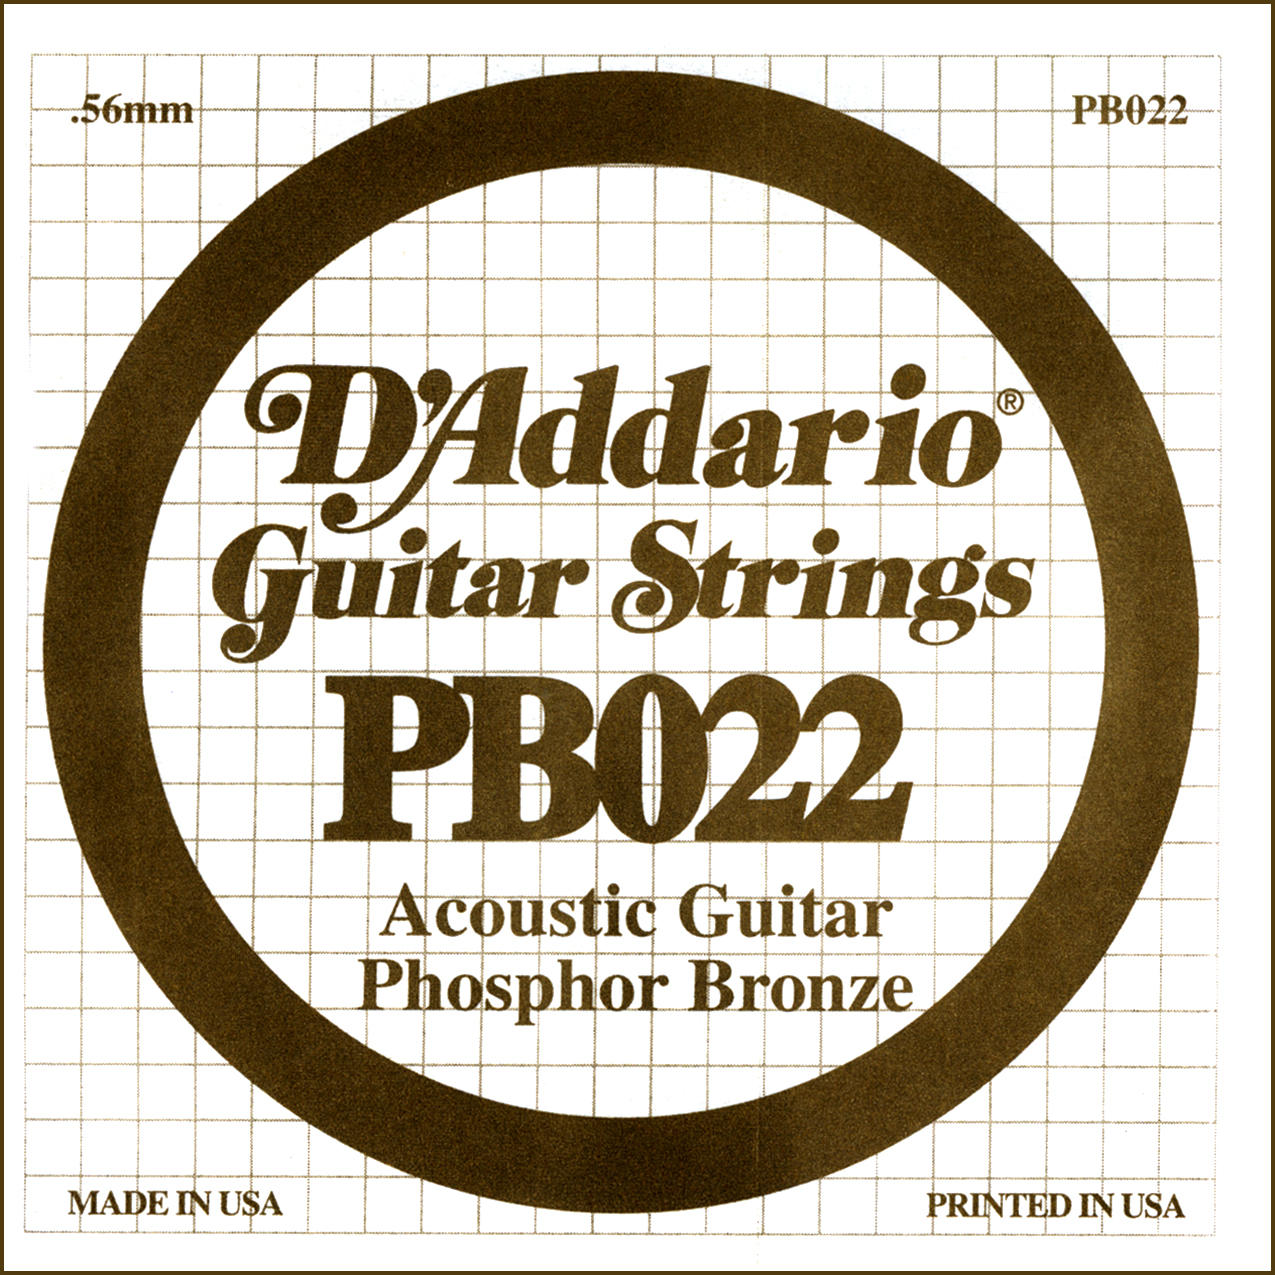 D'Addario Single Strings PBO22